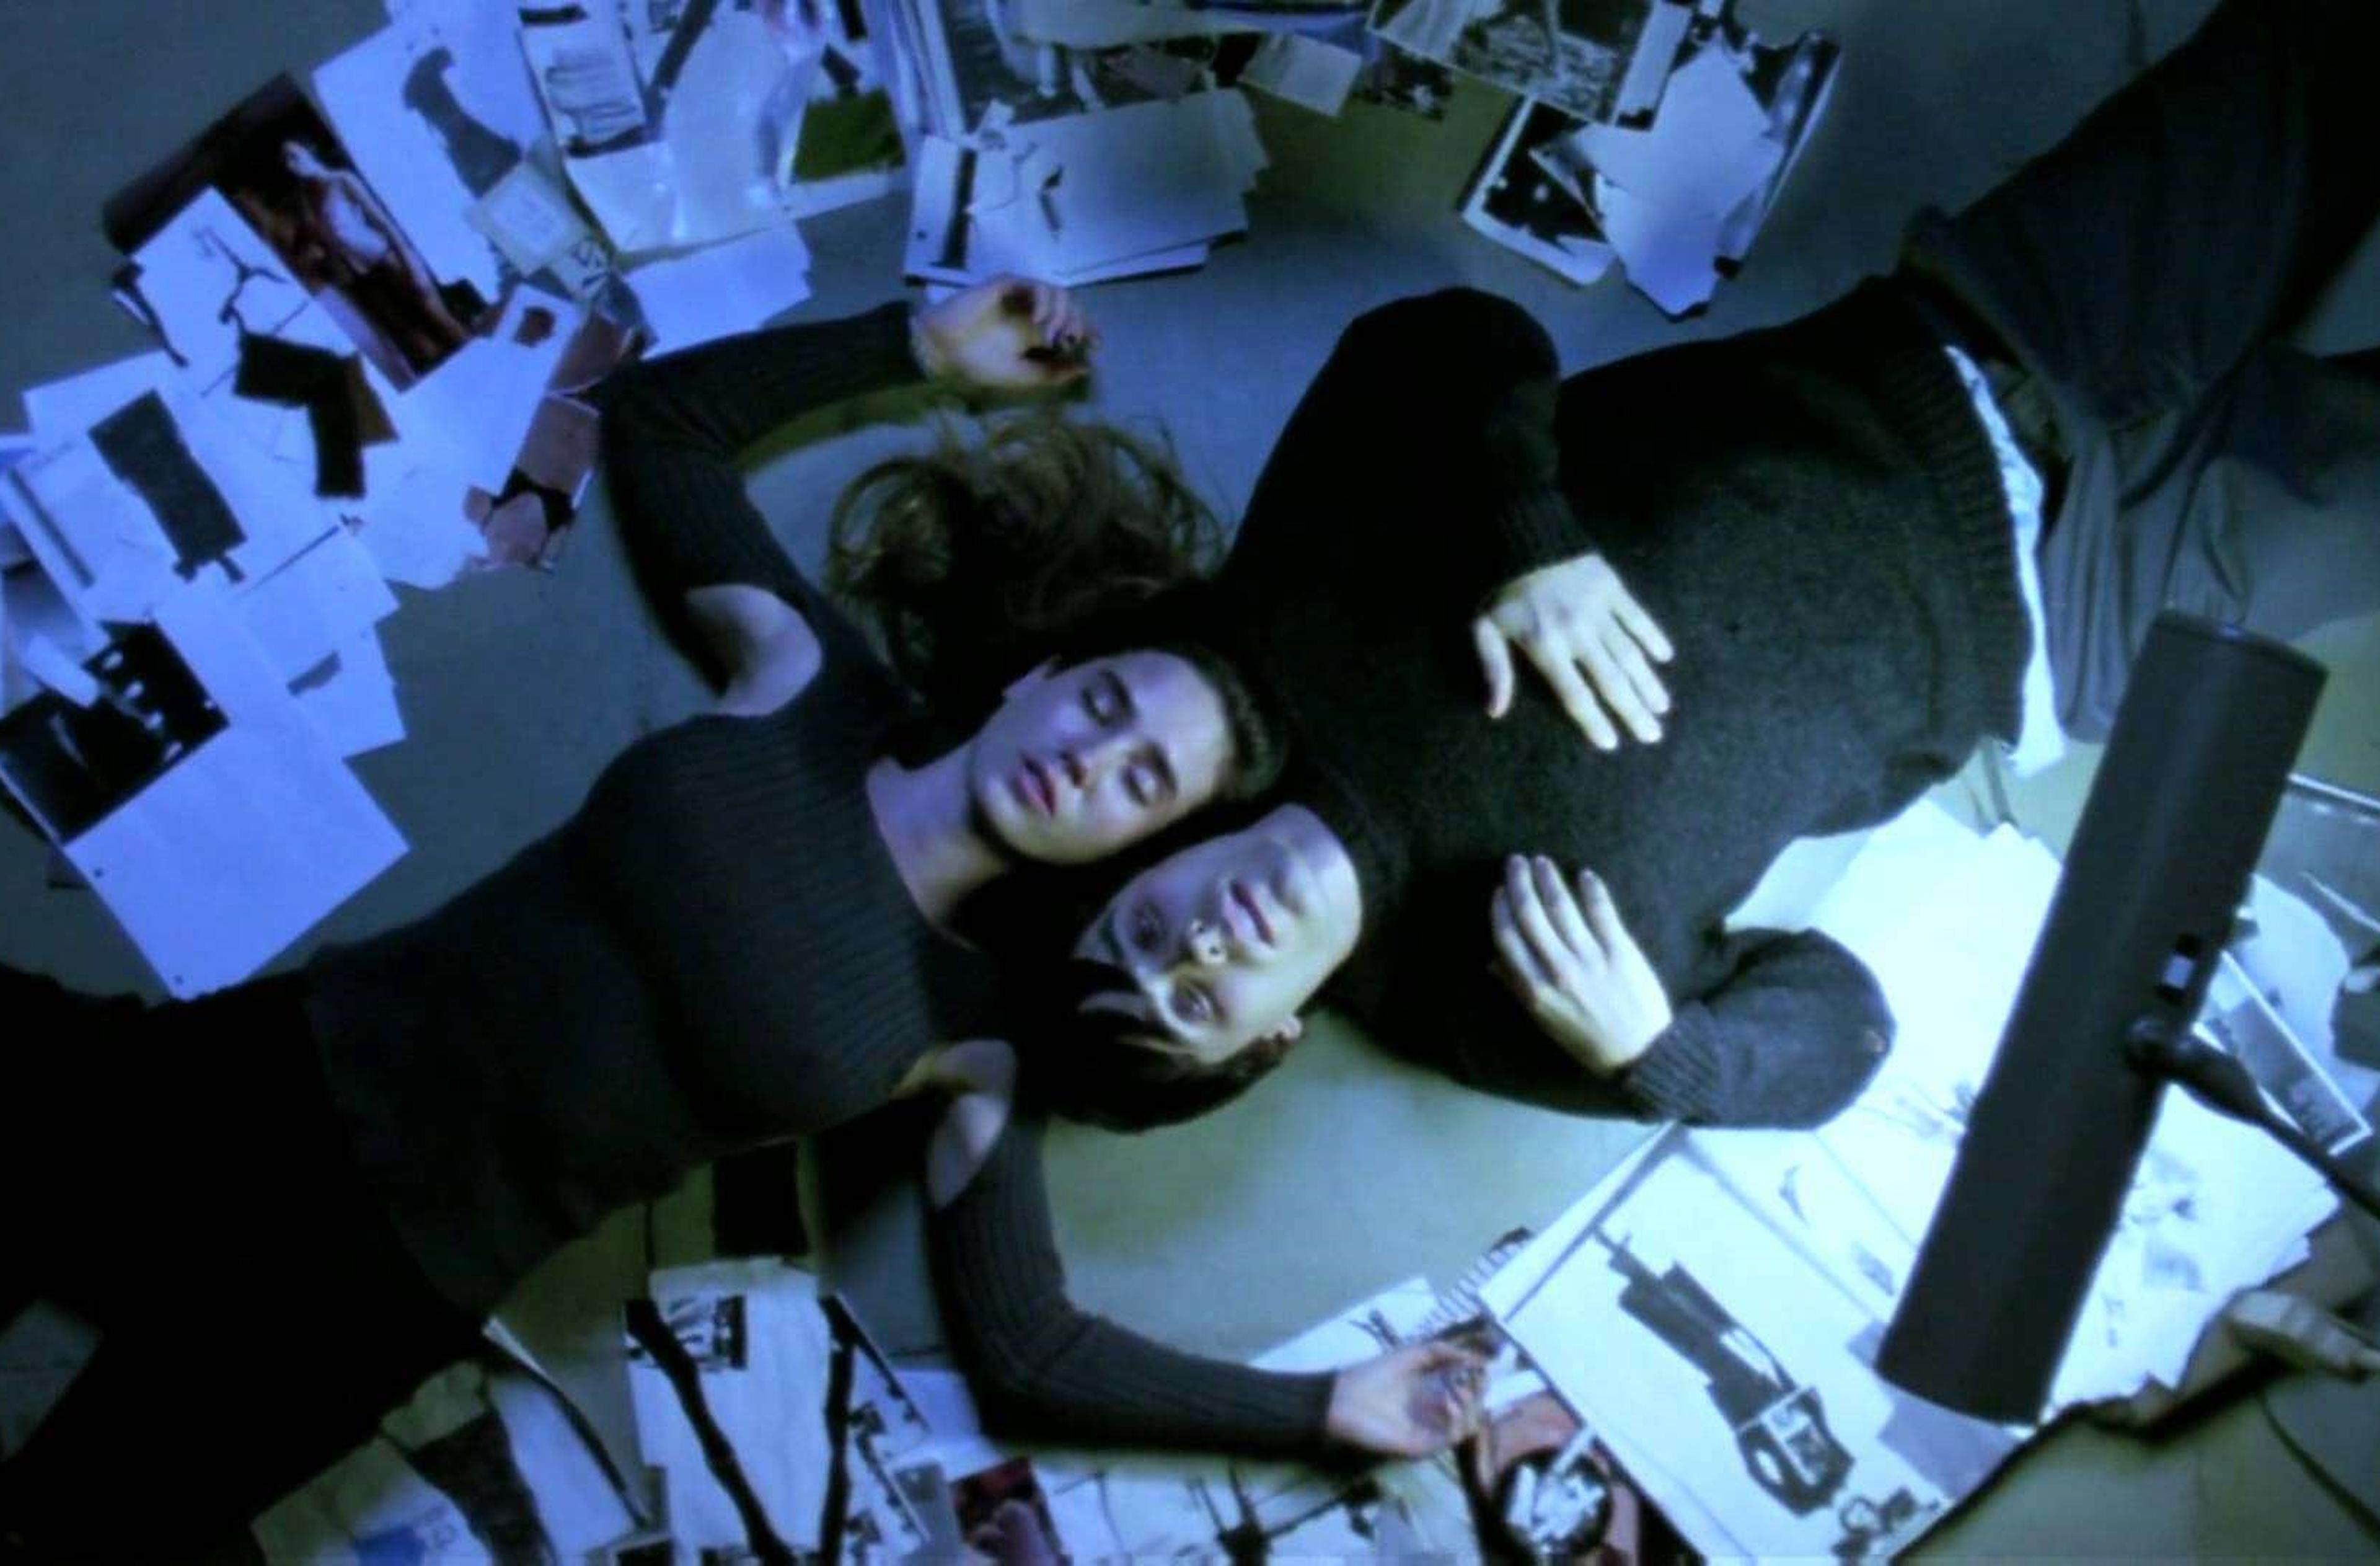 Requiem for a dream, locandina del film